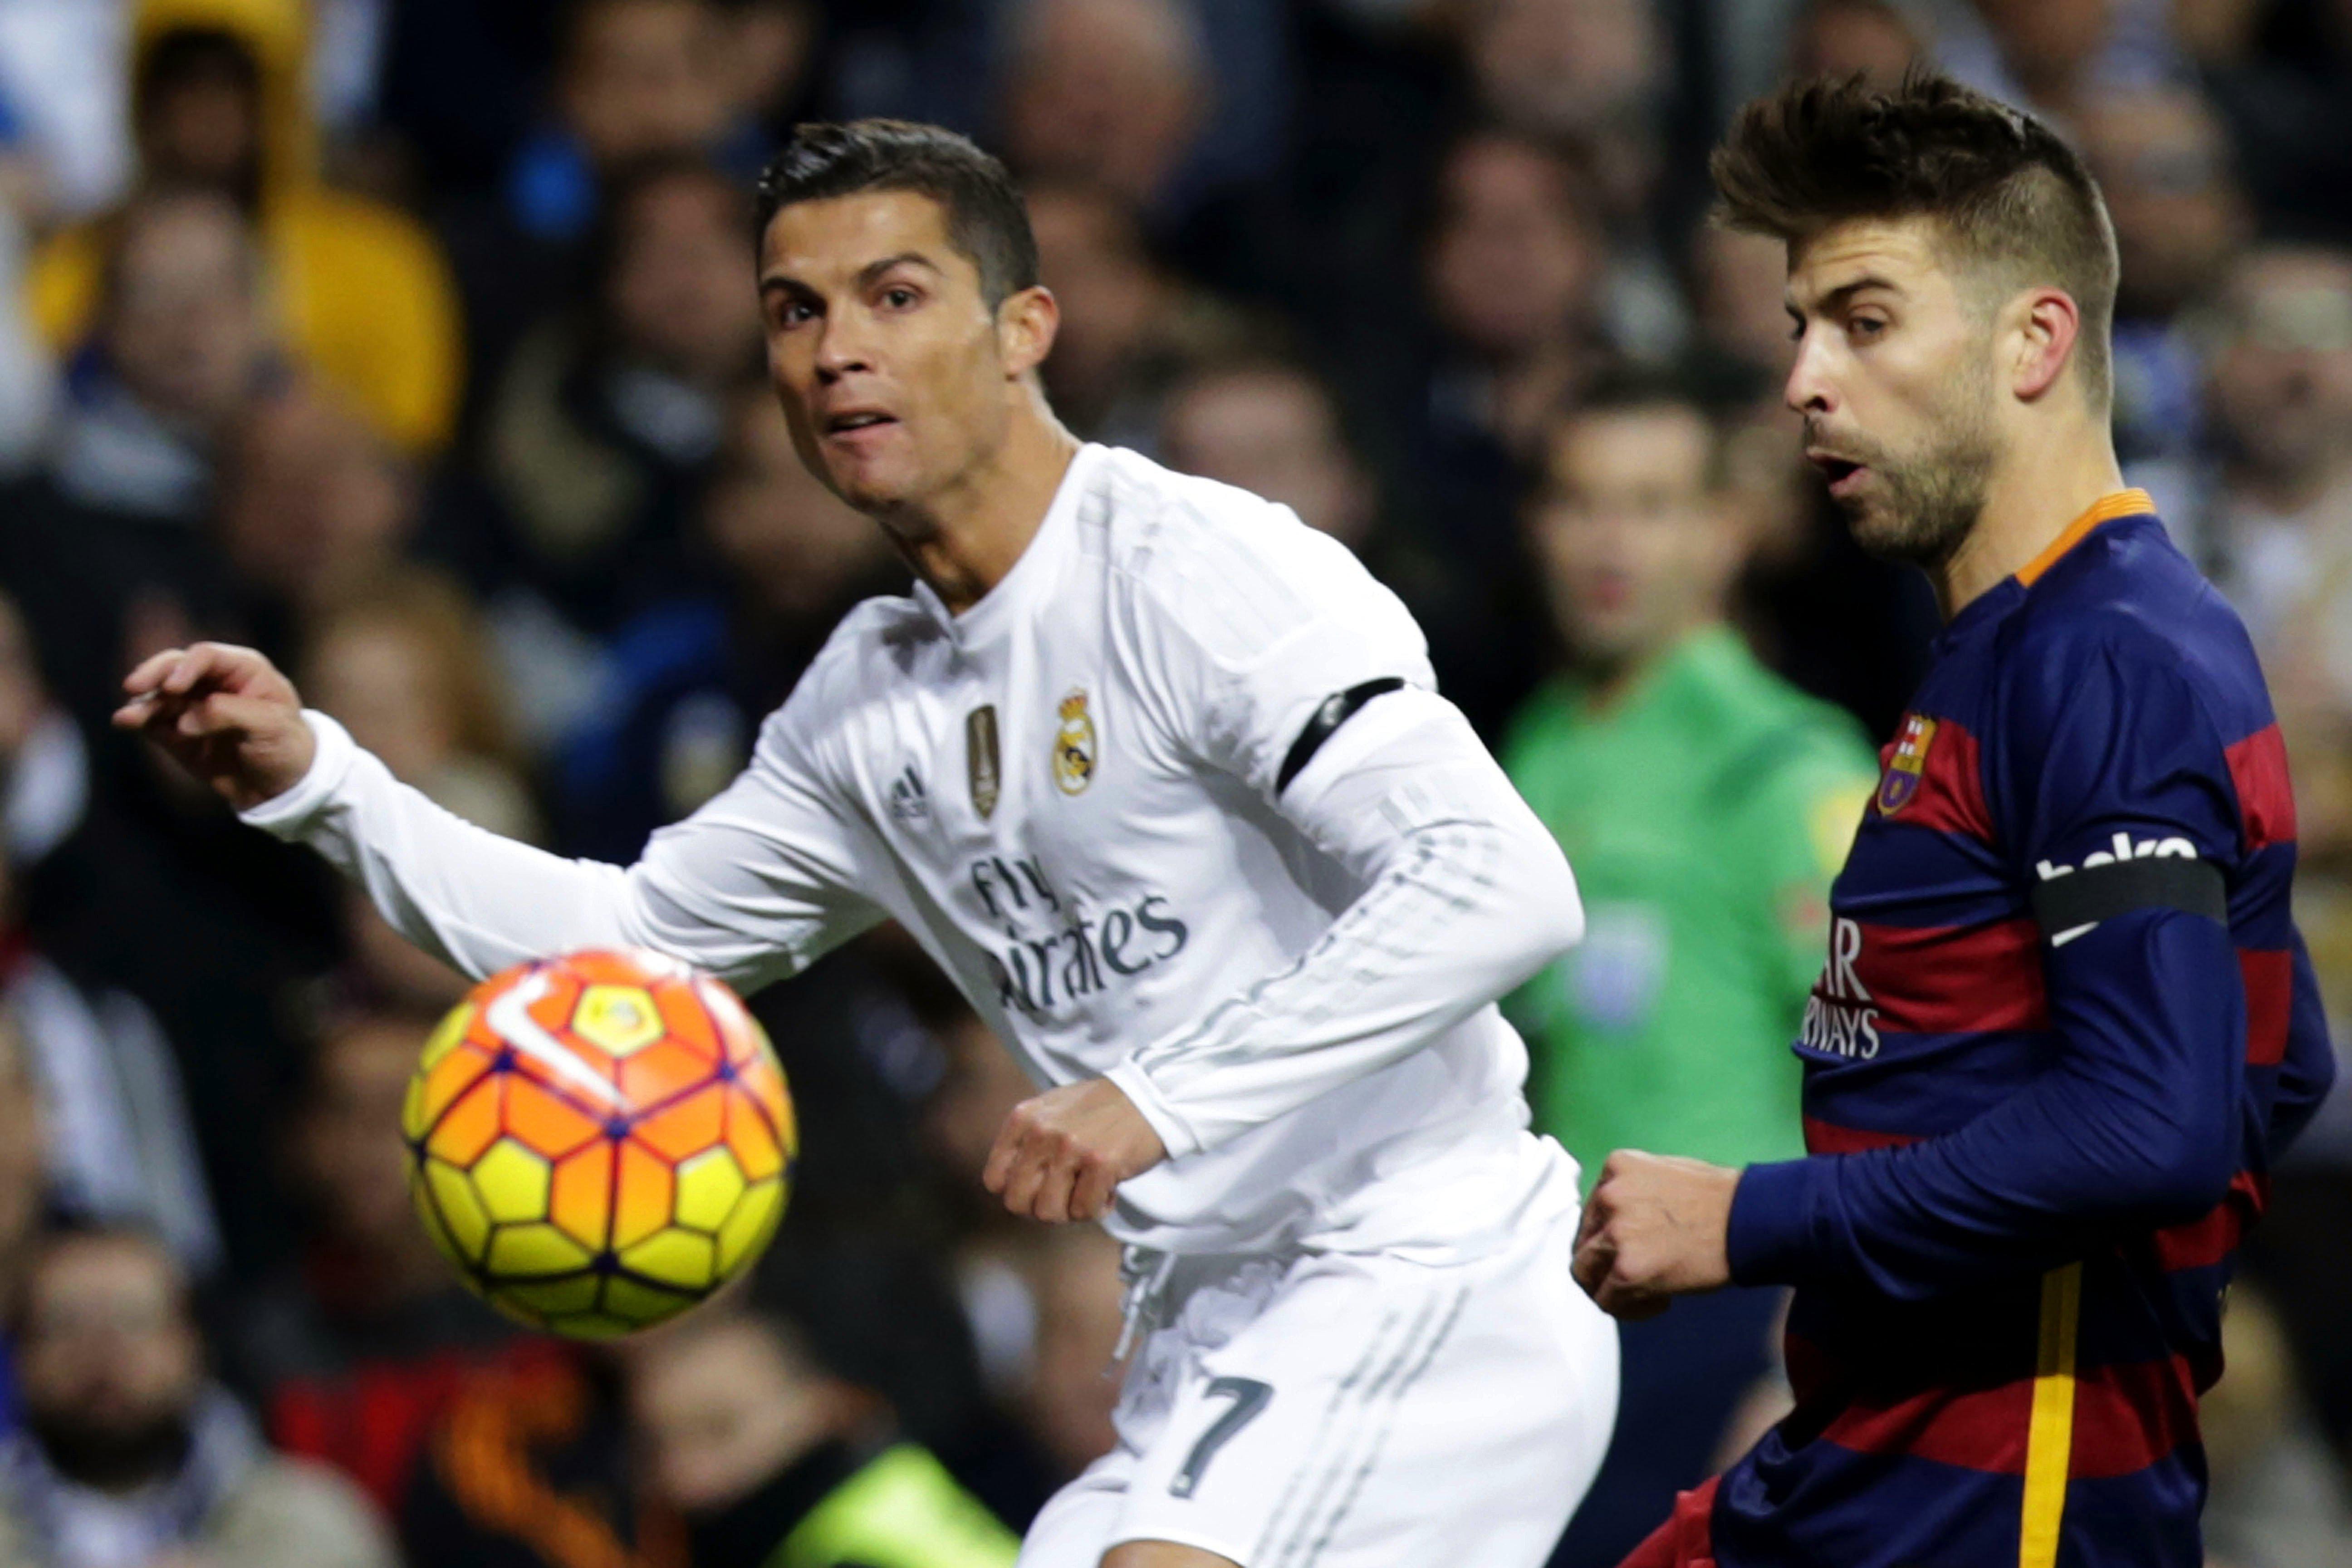 Barcelona vs real madrid el ltimo cl sico de cristiano for Ultimo partido del real madrid